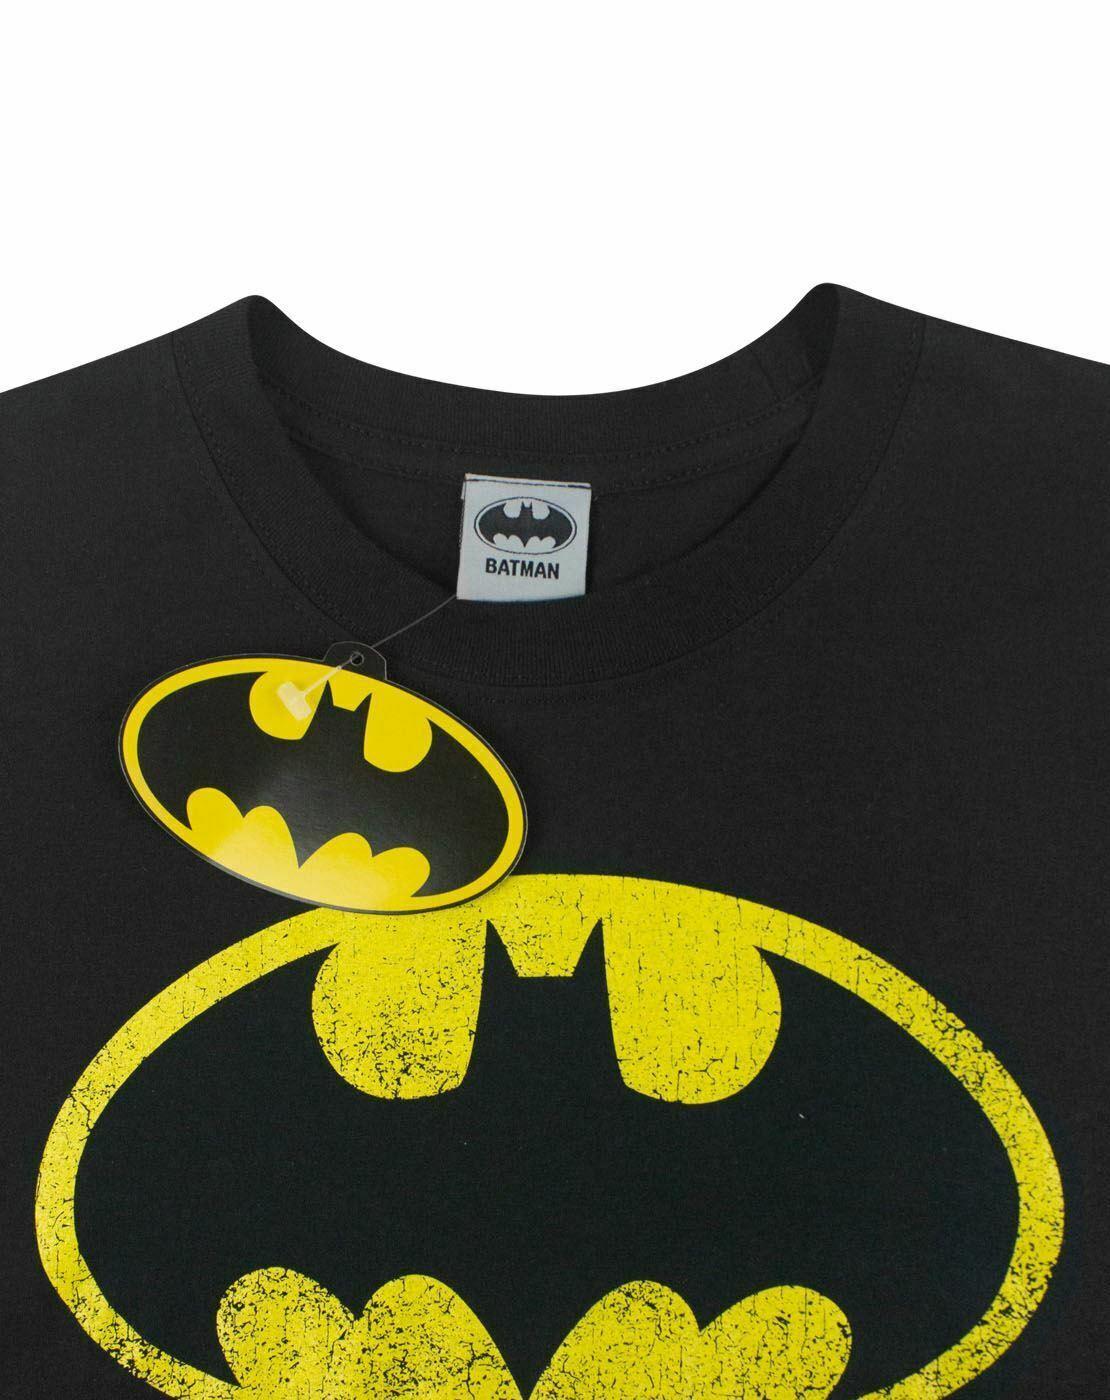 Batman-Distressed-Logo-Men-039-s-Adults-Black-T-Shirt-Top thumbnail 13